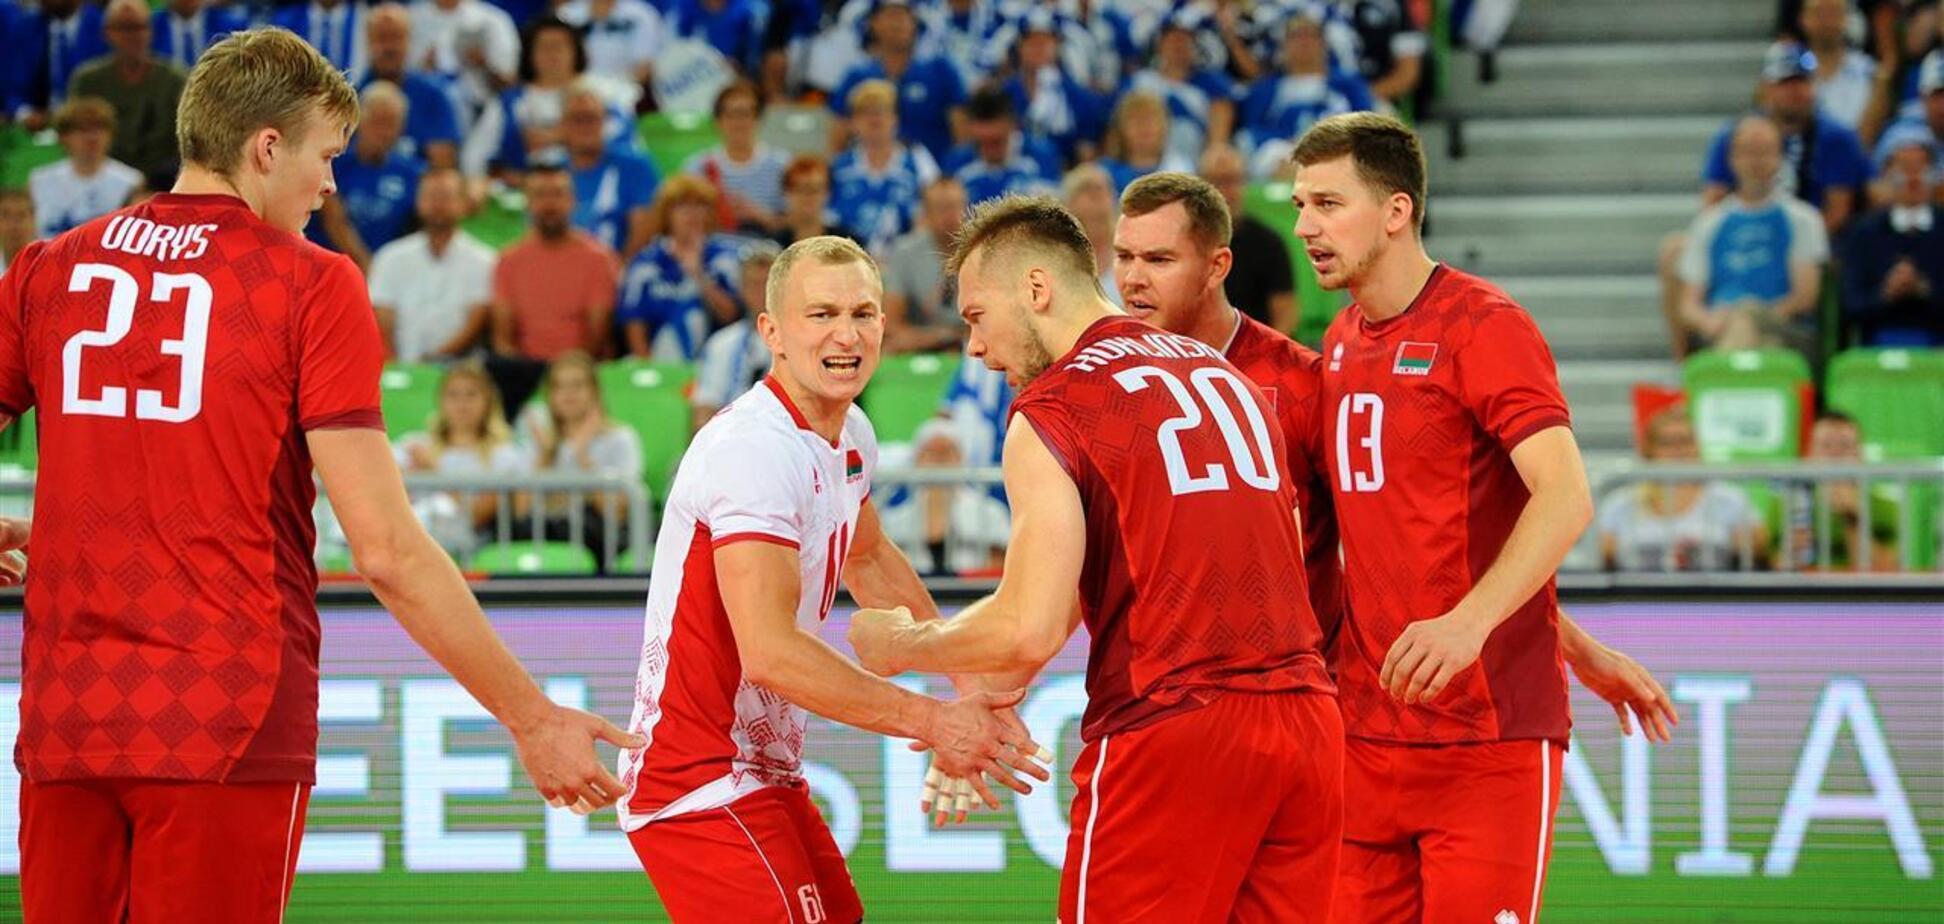 збірна Білорусі з волейболу